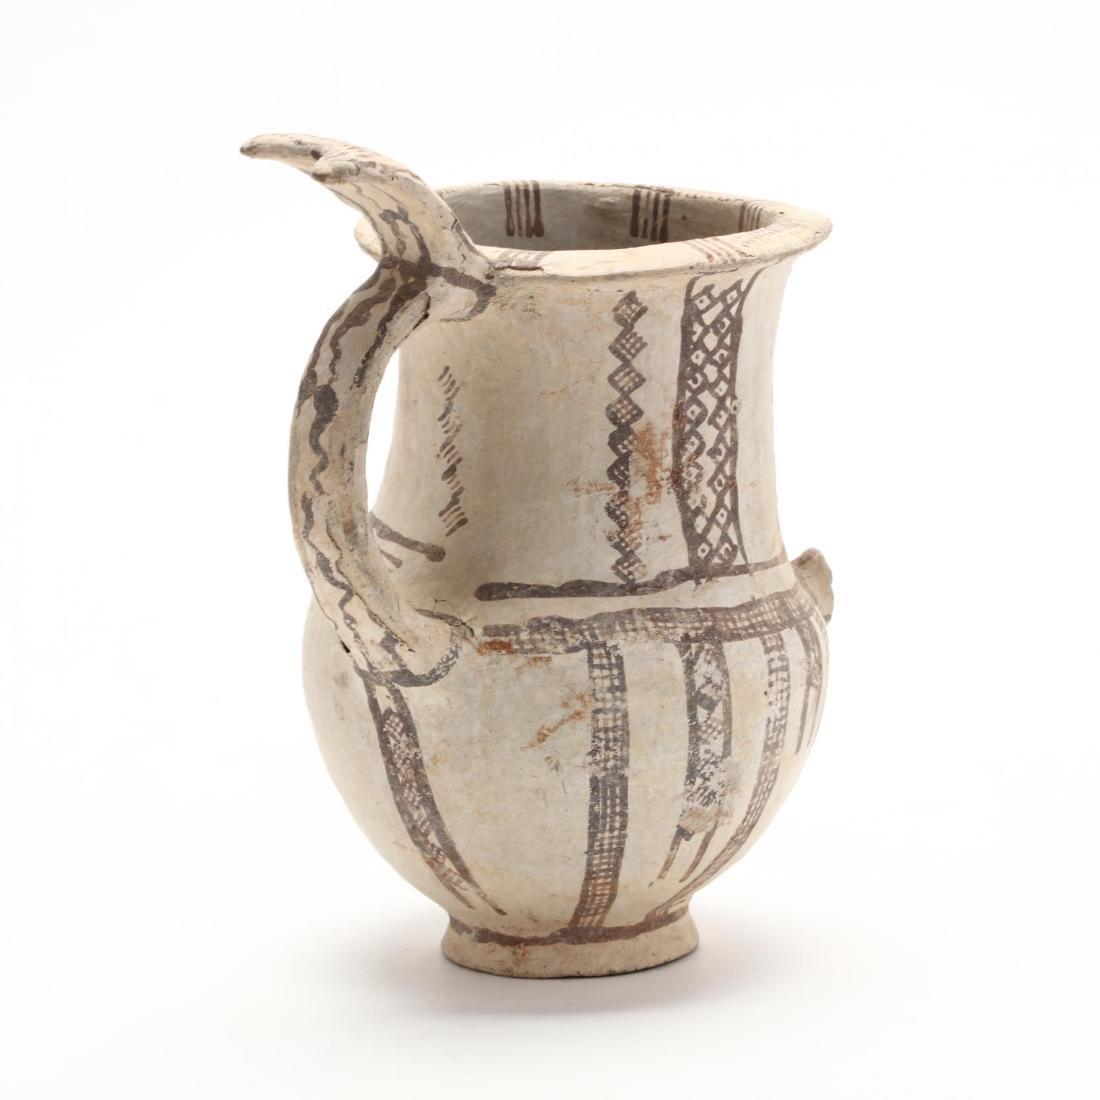 Cypriot Bronze Age Bichrome Jug - 4